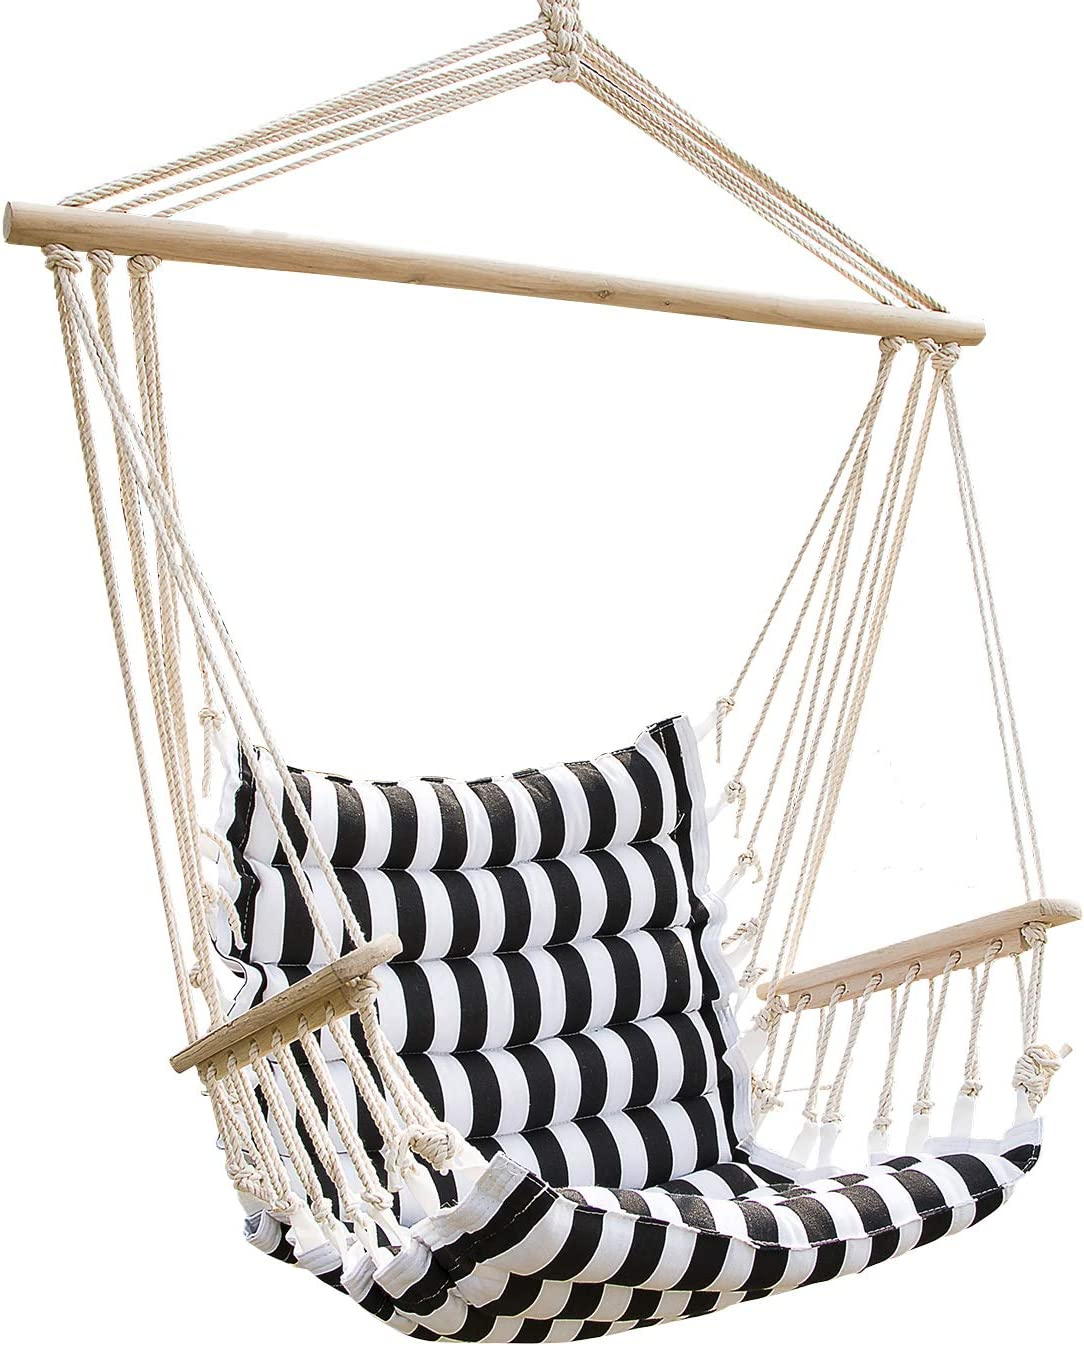 Amazon Com Uhom Hanging Hammock Swing Chair Patio Seat With Wood Stick Indoor Outdoor Furniture Decor